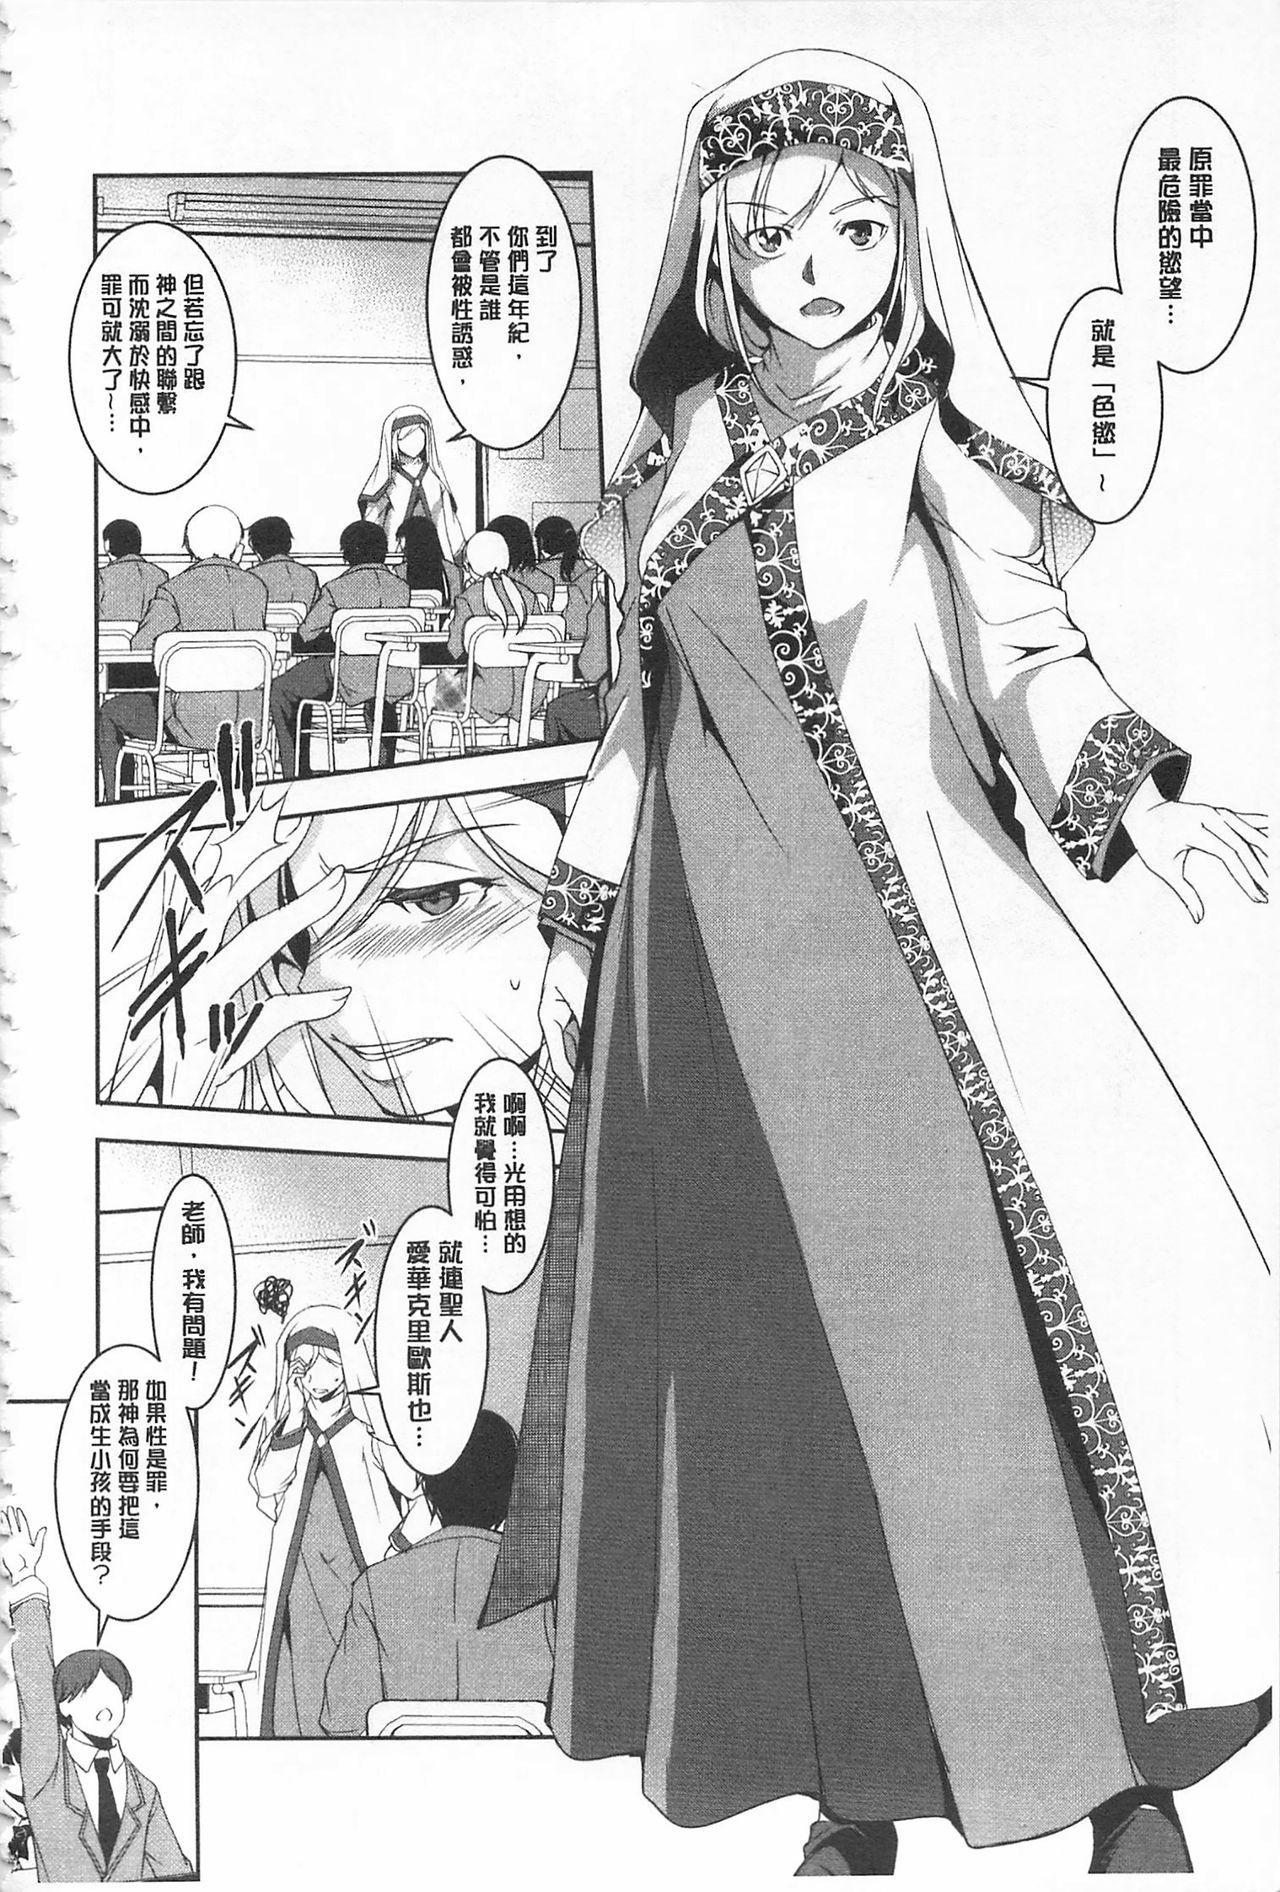 [Amano Kazumi] Seida Inyou -Seijo no Katachi Shita Intou- | 聖墮陰陽 -聖女的容貌與淫蕩- [Chinese] 13